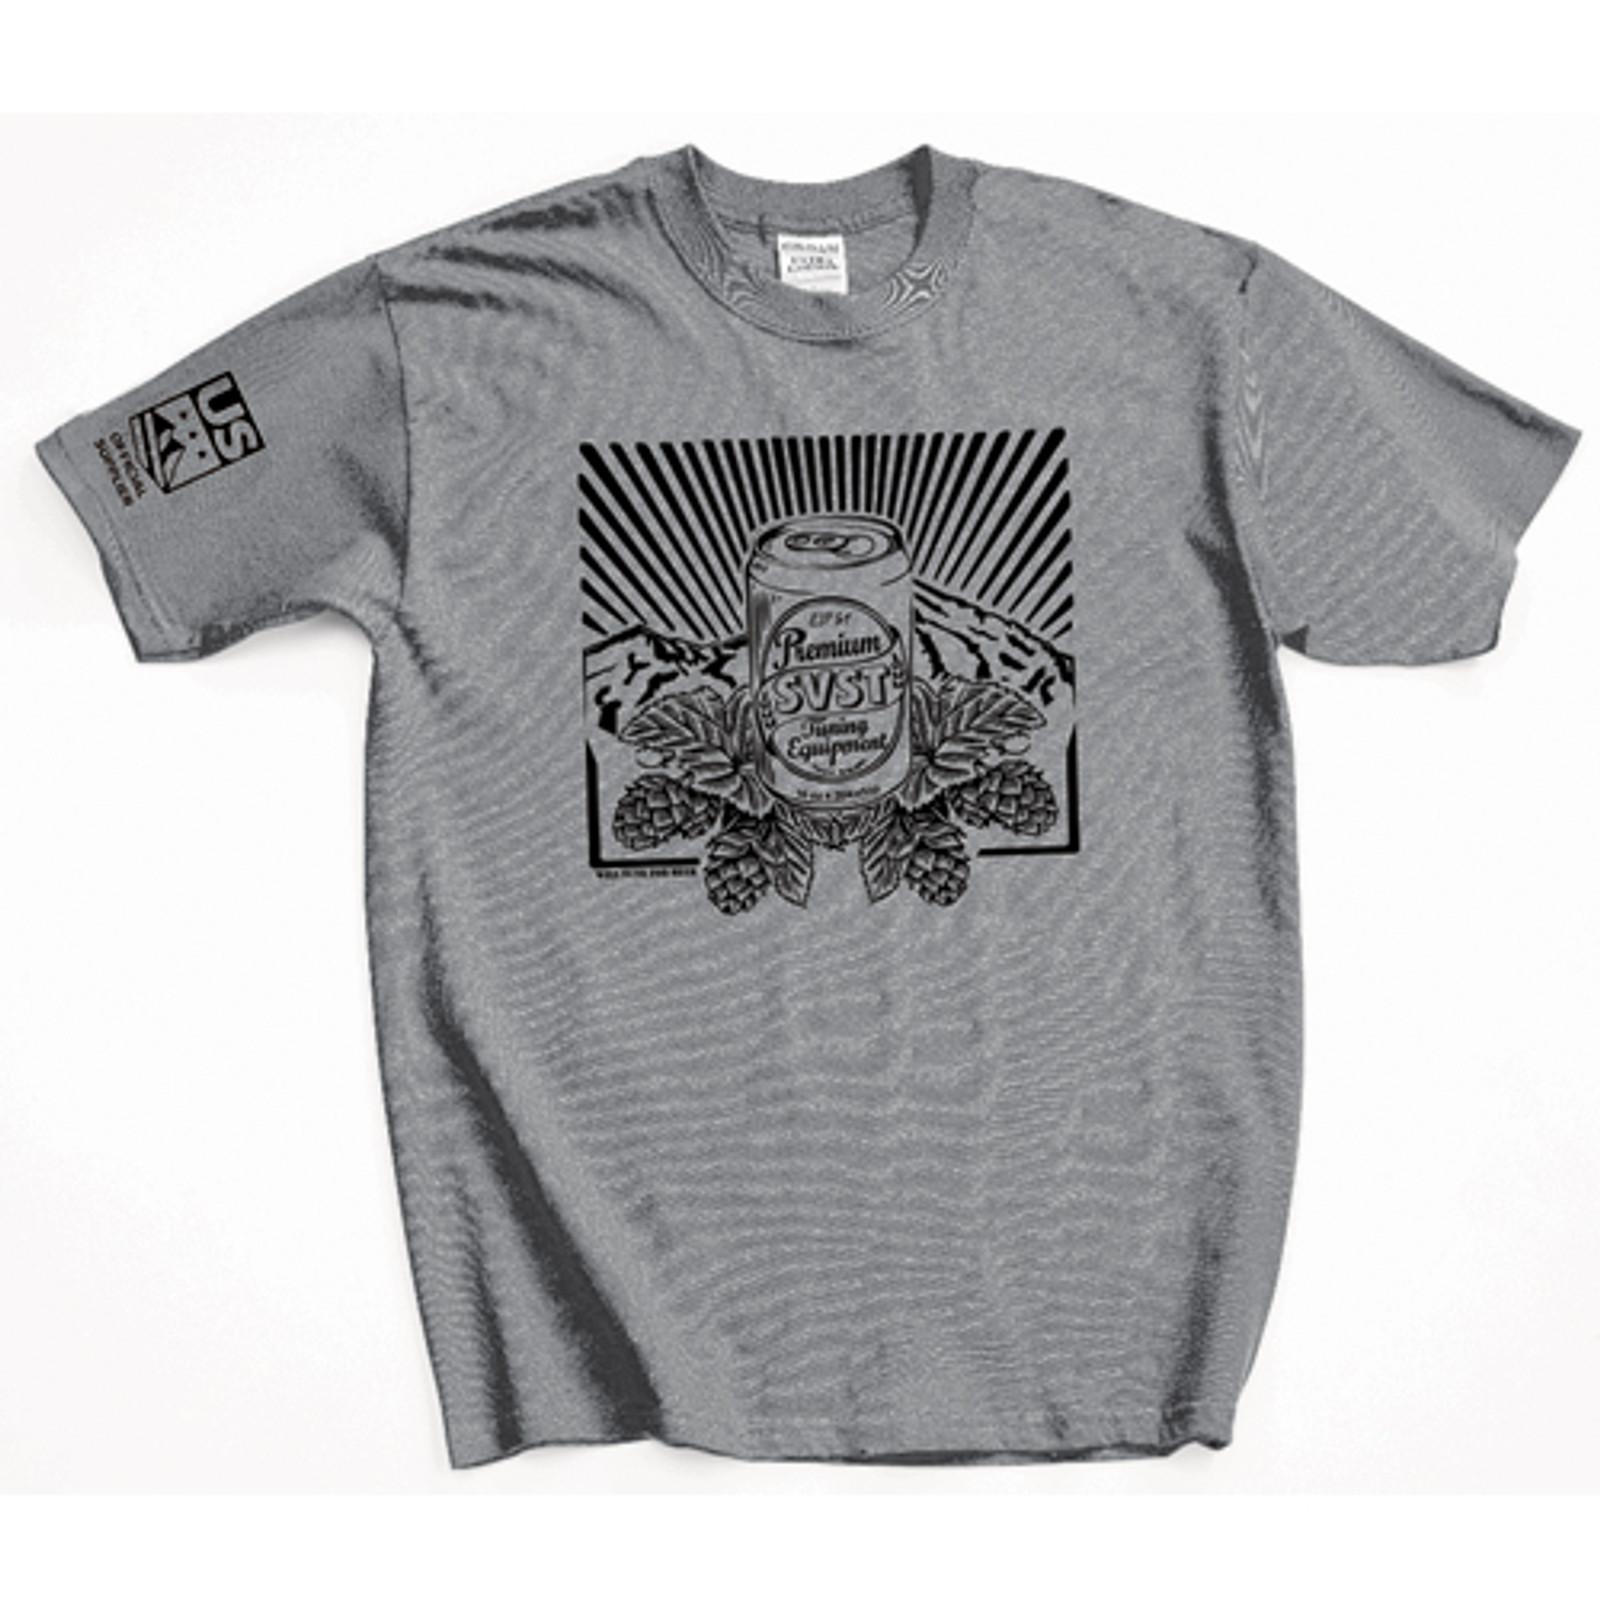 SVST CAN T-Shirt *Grey*